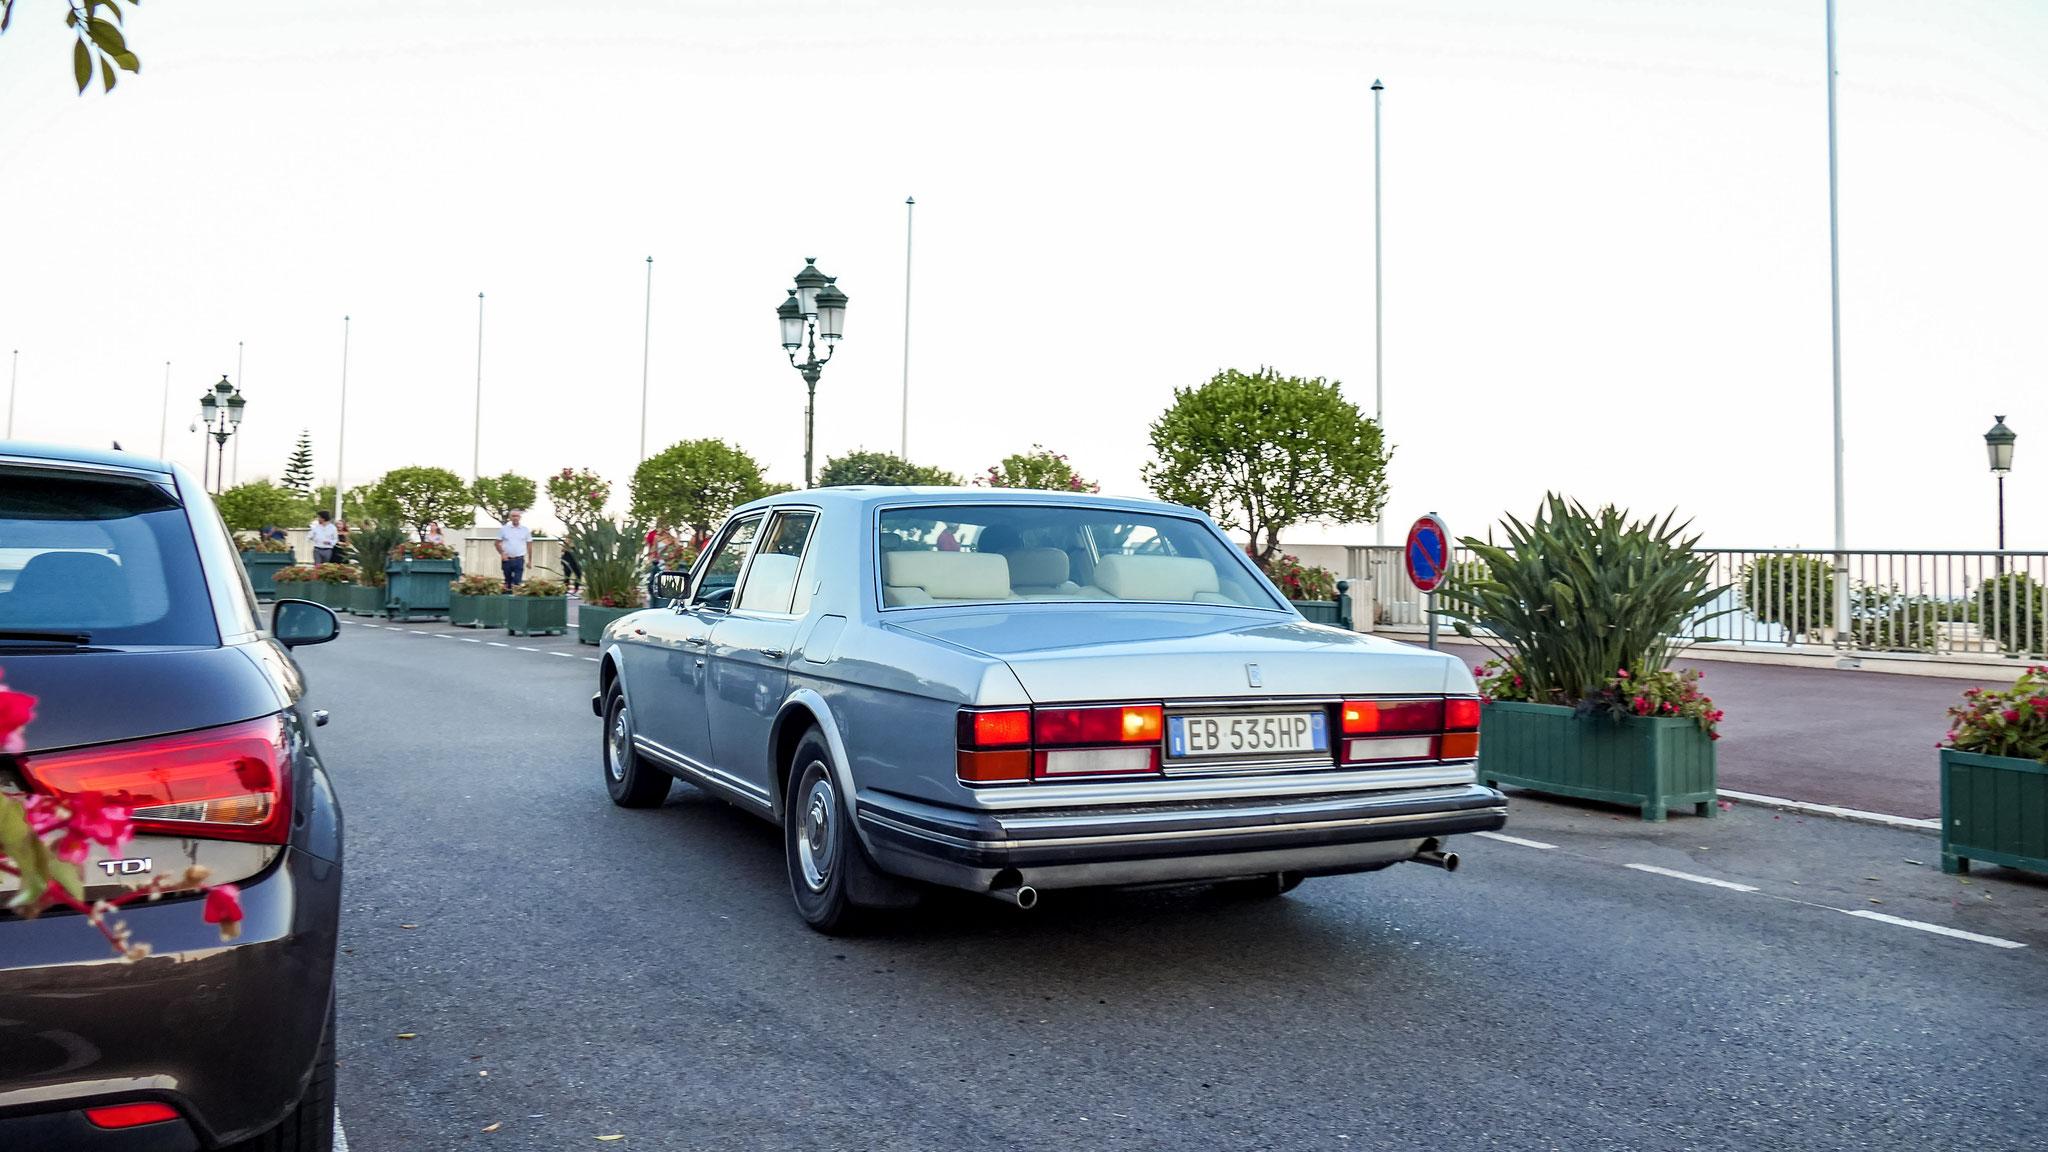 Rolls Royce Silver Spirit - EB-535-HP (ITA)